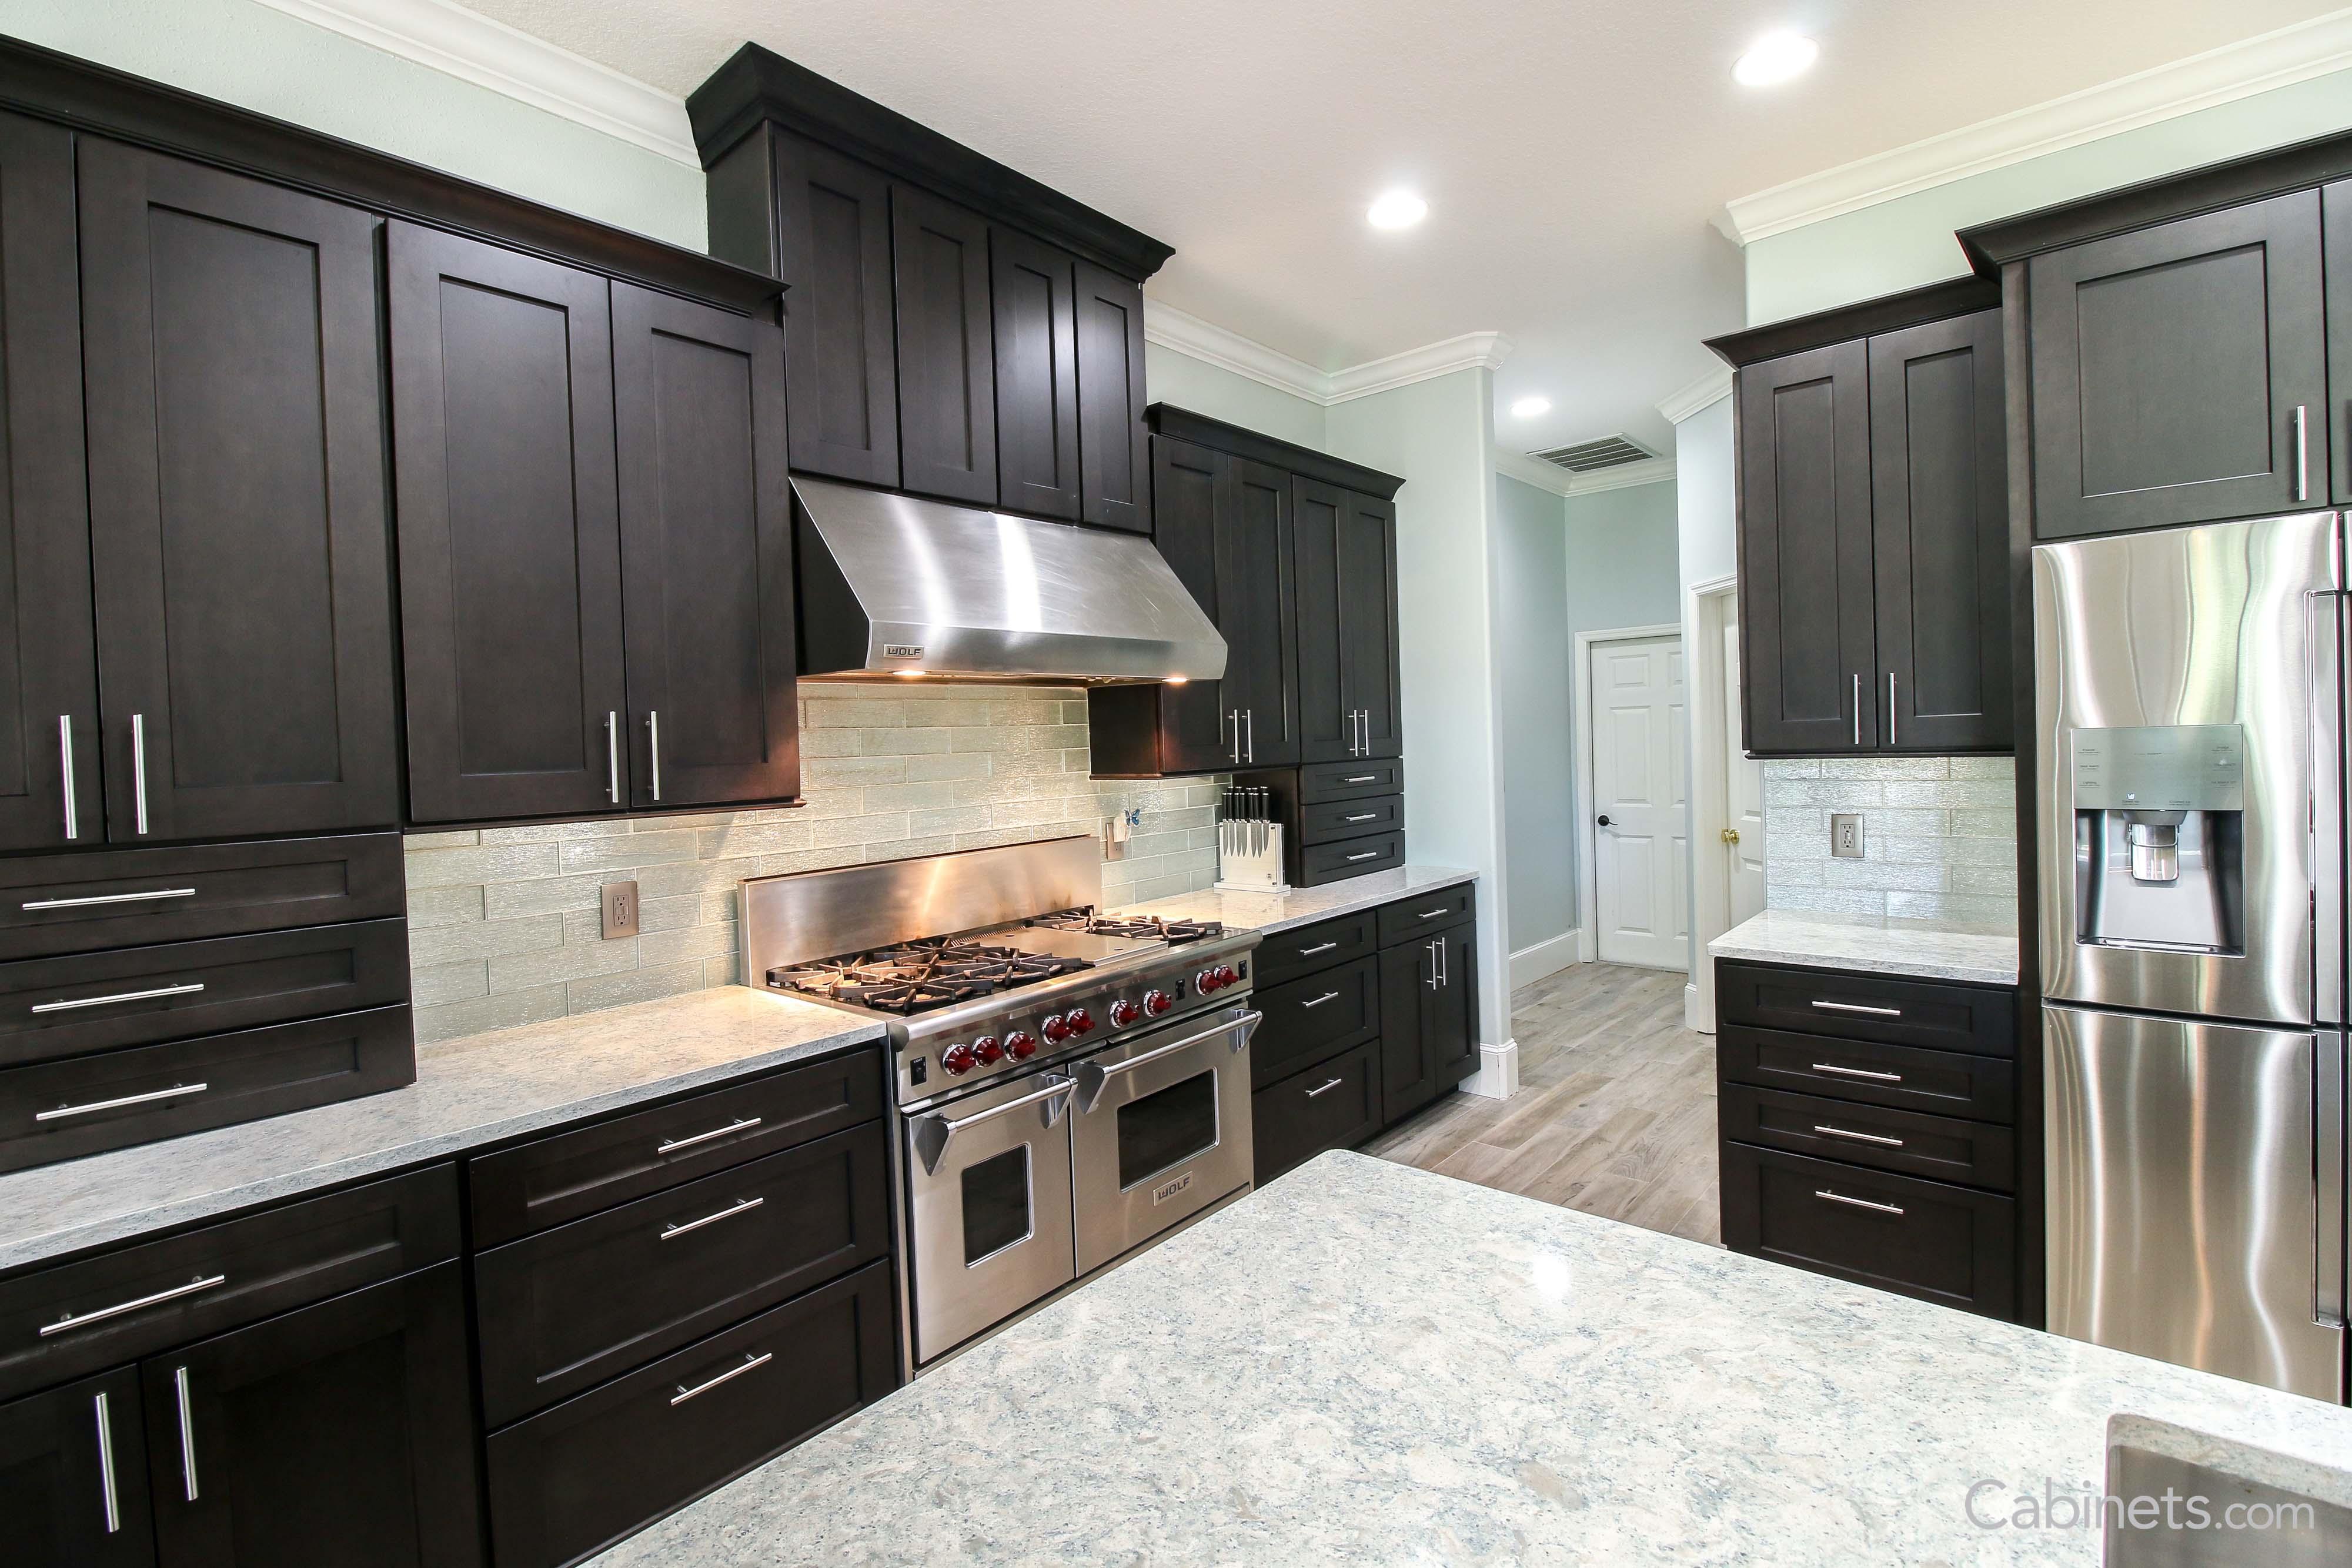 Kitchen Countertop Ideas You'll Love   Cabinets.com